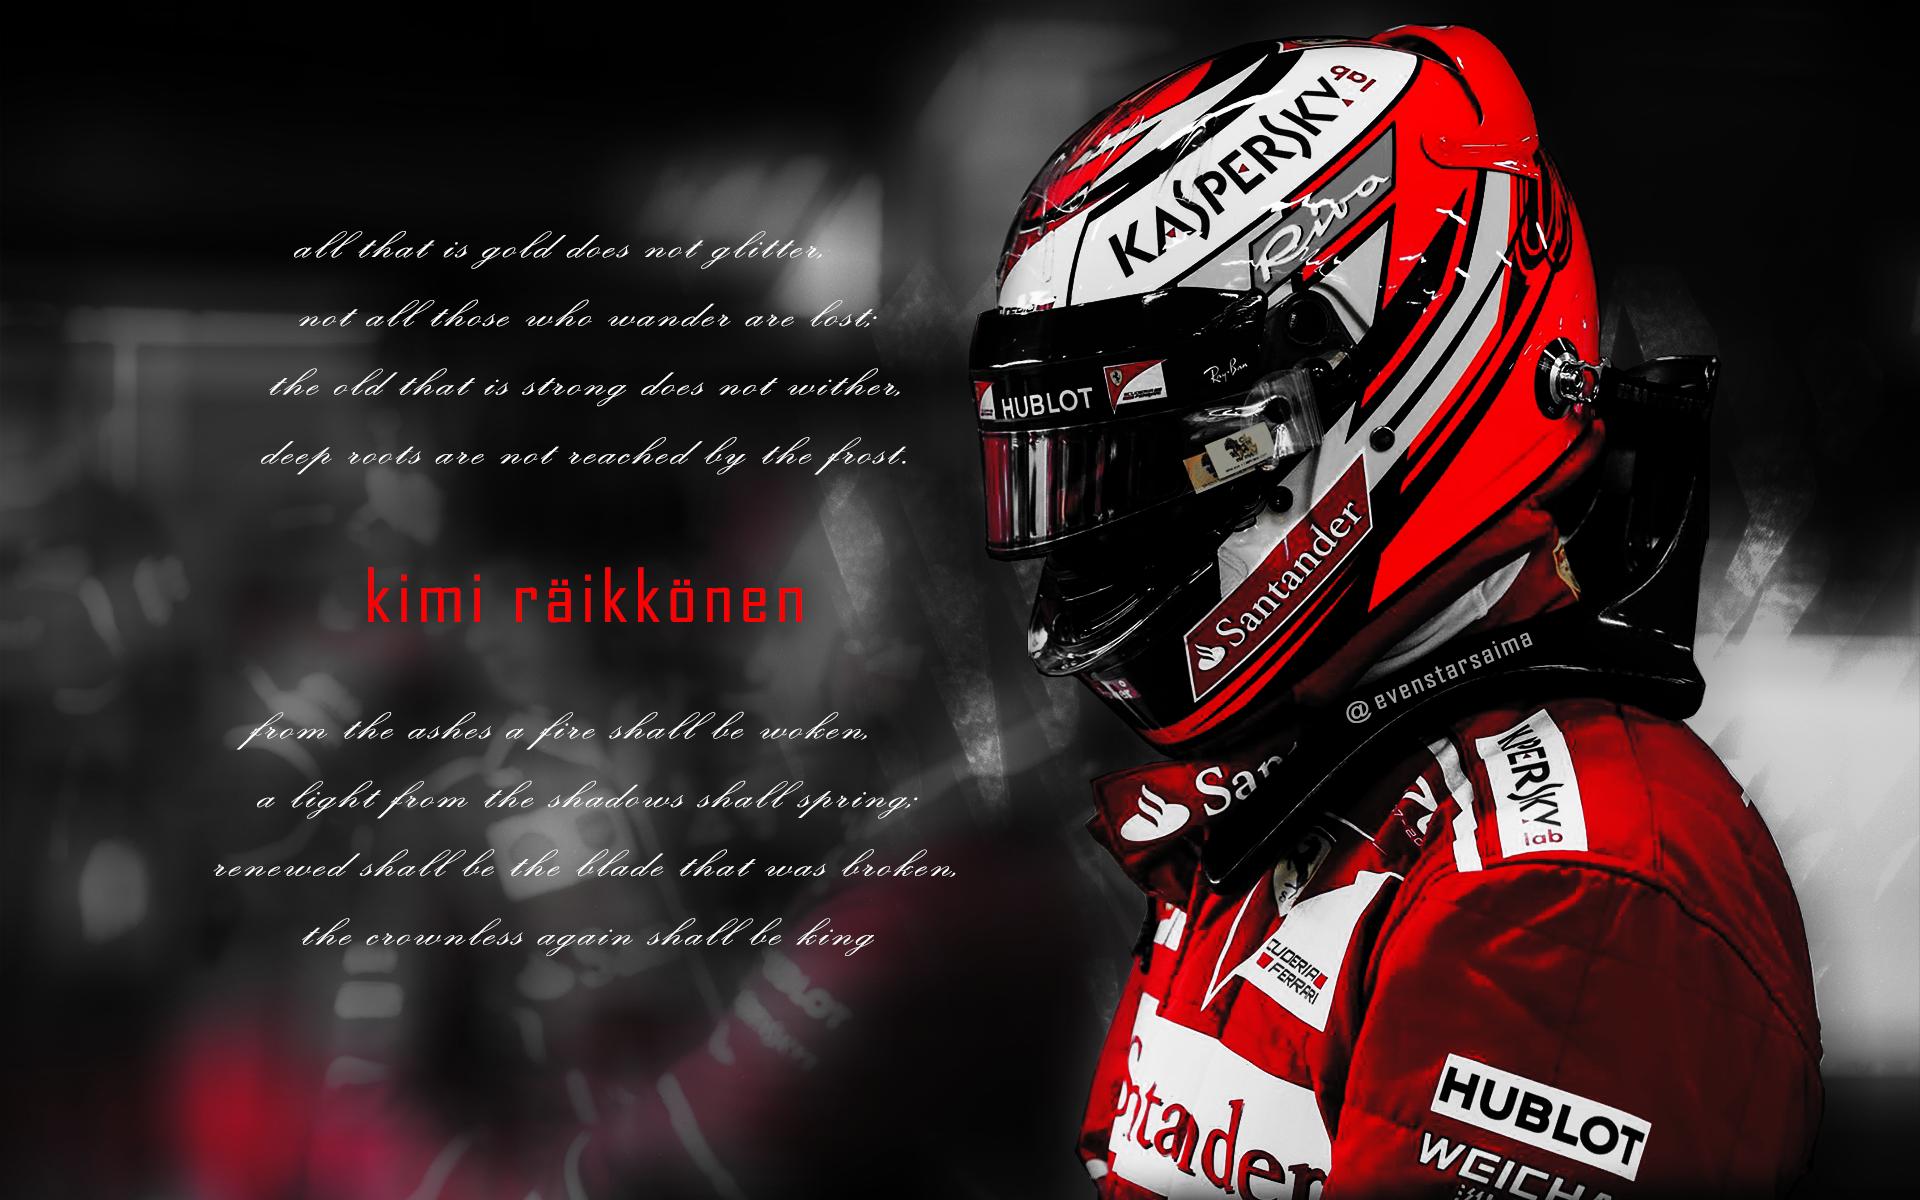 2017 Banners And Desktop Kimi Räikkönen Space